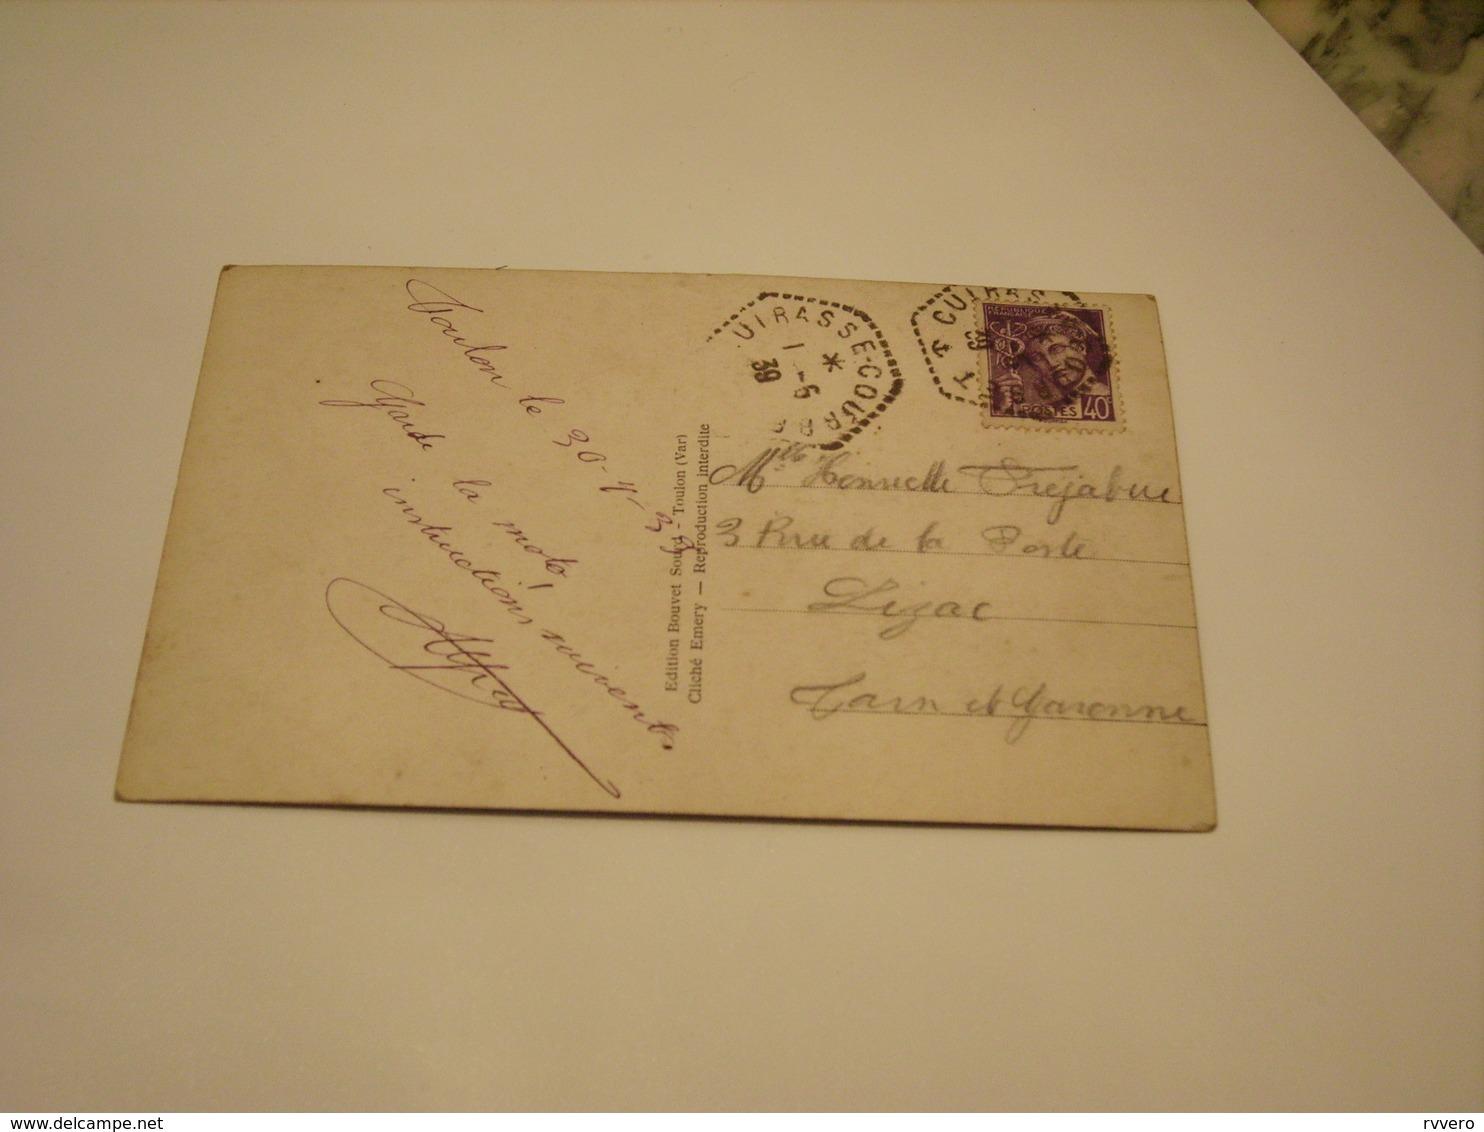 CUIRASSE COURBET 1939 - Matériel